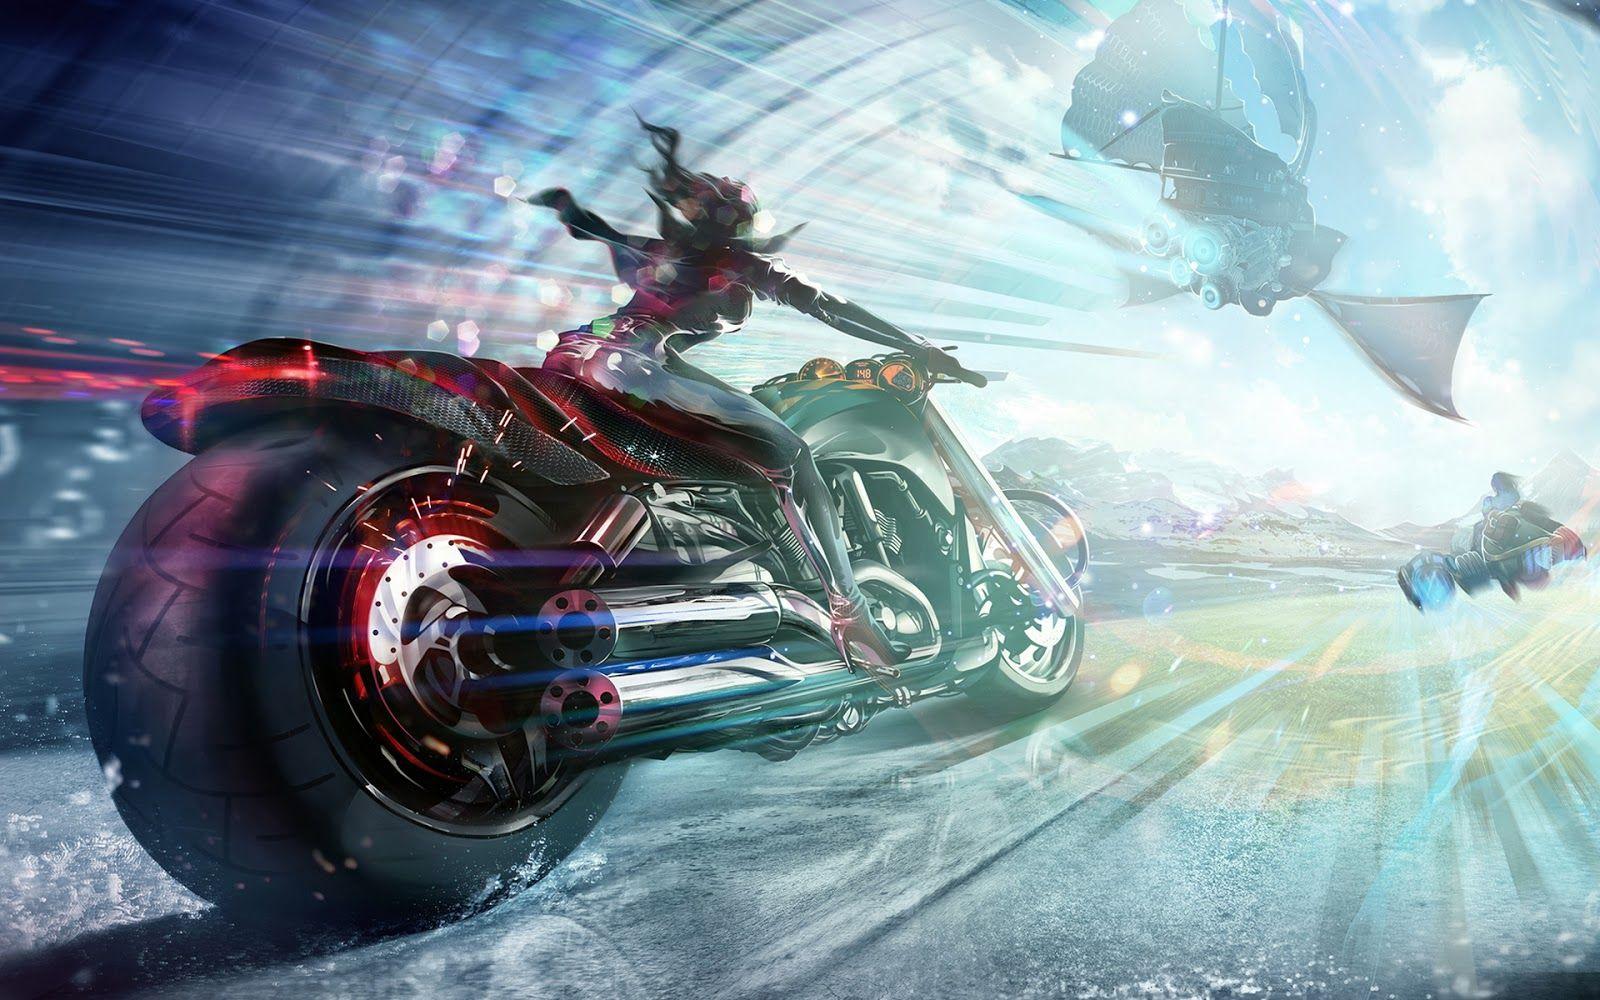 3d Bike Hd Wallpaper Hd Wallpapers Blog Biker Art Anime Wallpaper Art Wallpaper